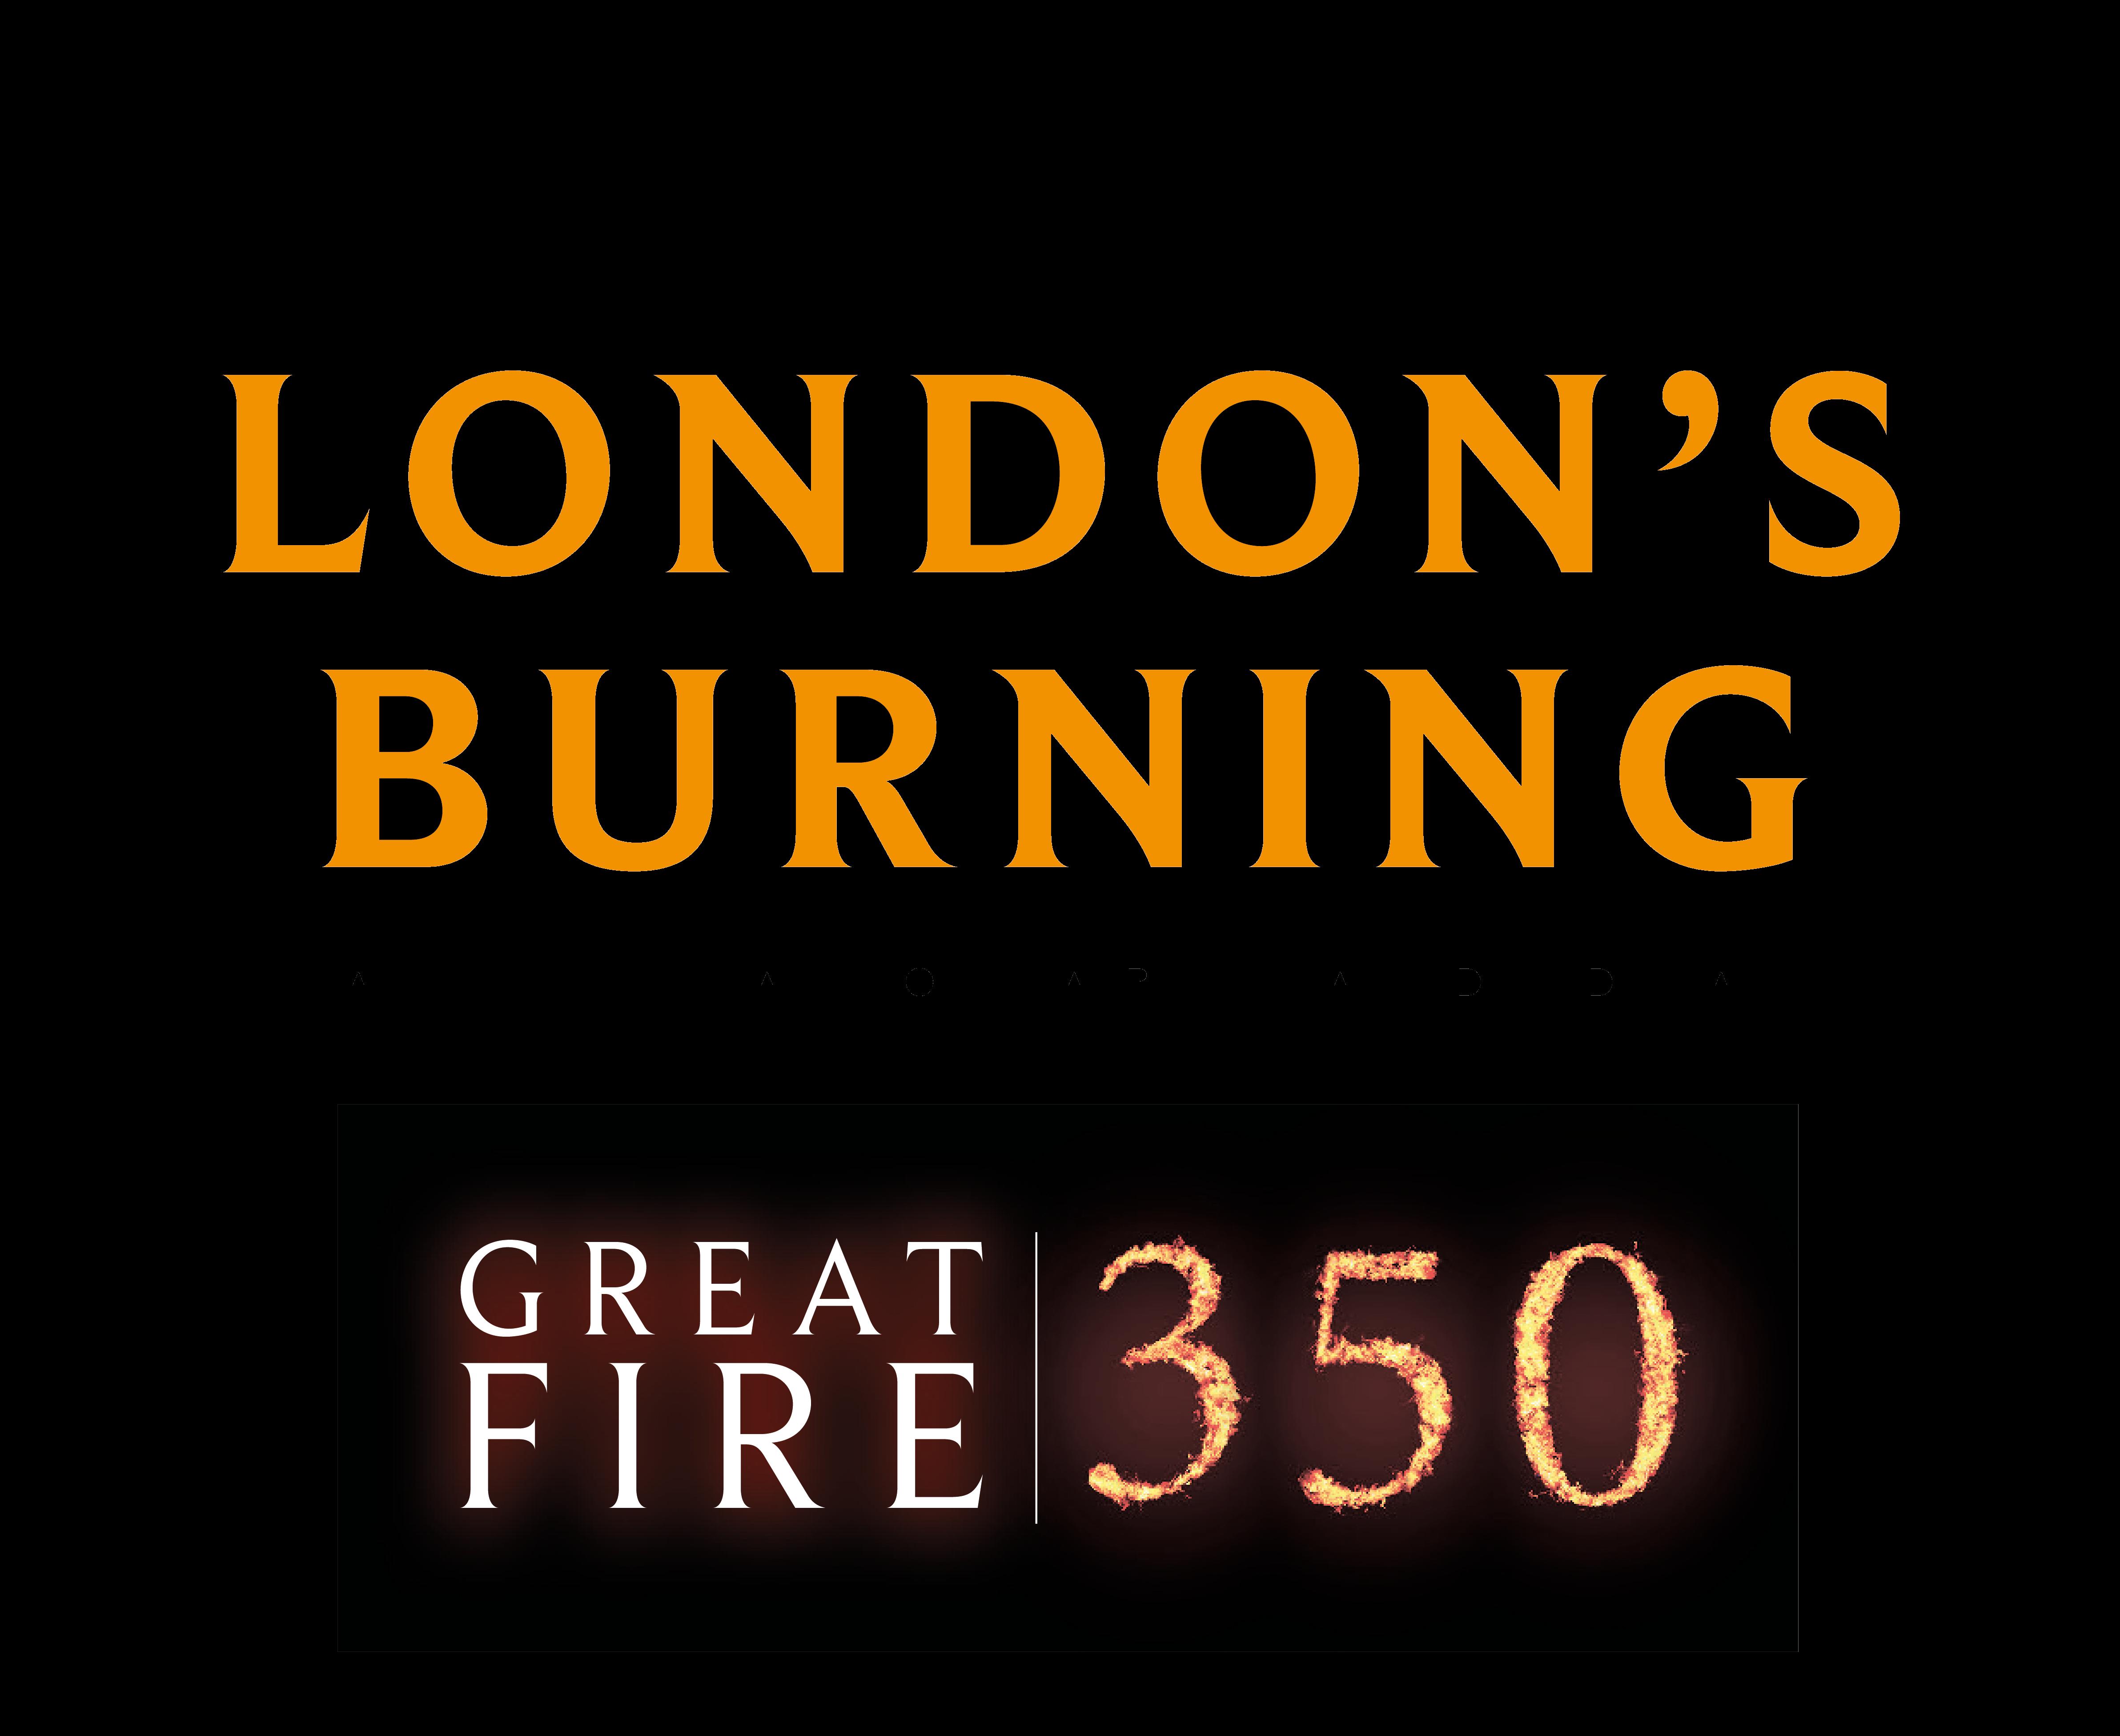 London's Burning, Great fire 350 logo